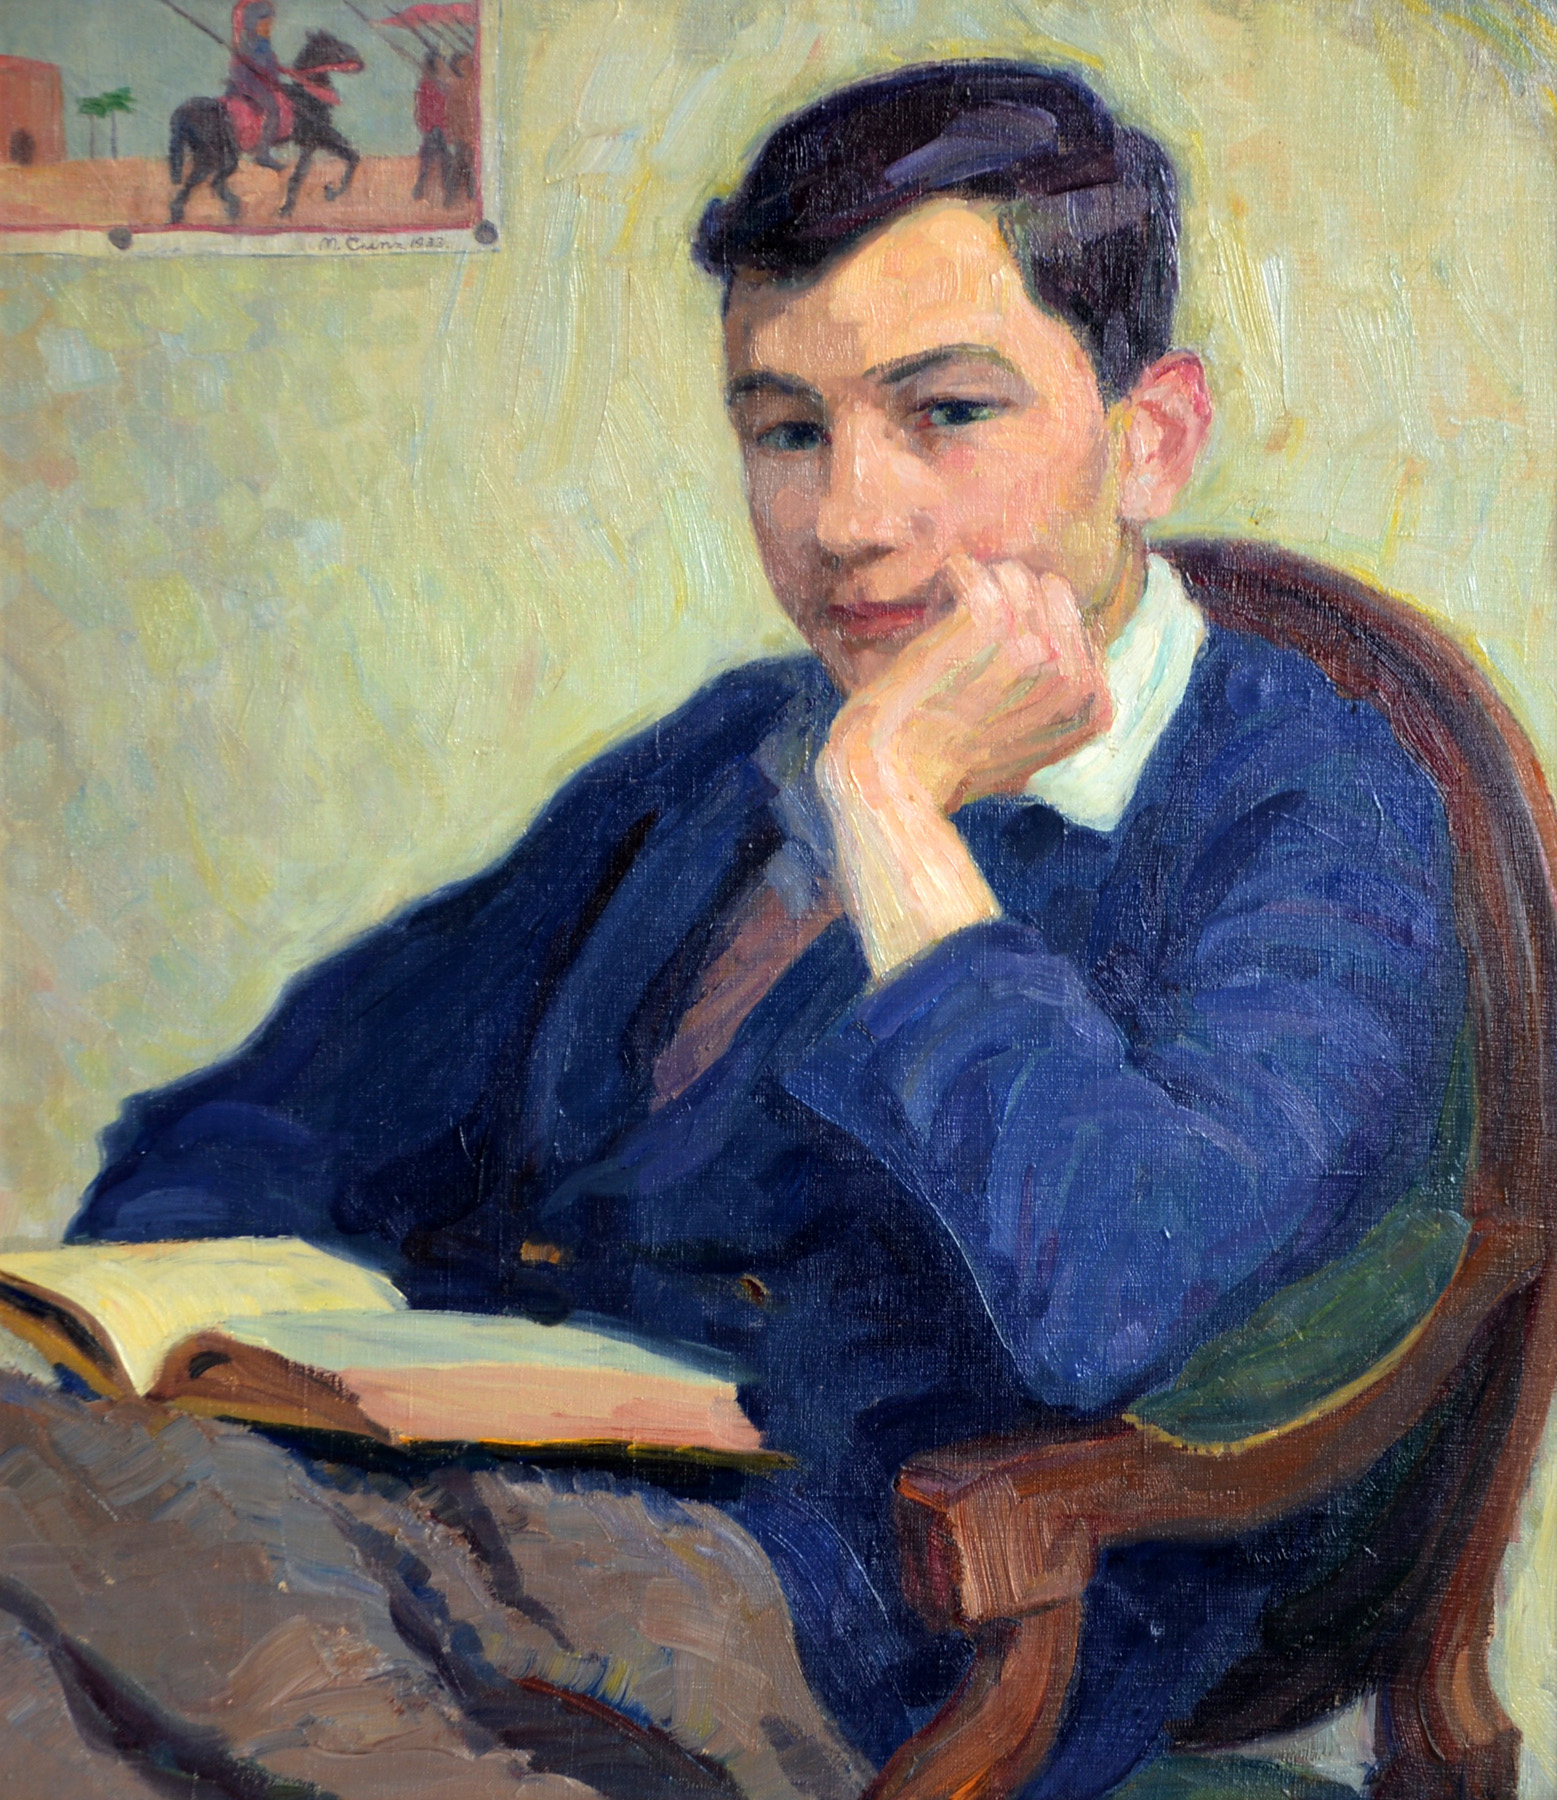 Porträt Eugen Cunz lesend, 1933. Öl auf Leinwand. 66 x 58